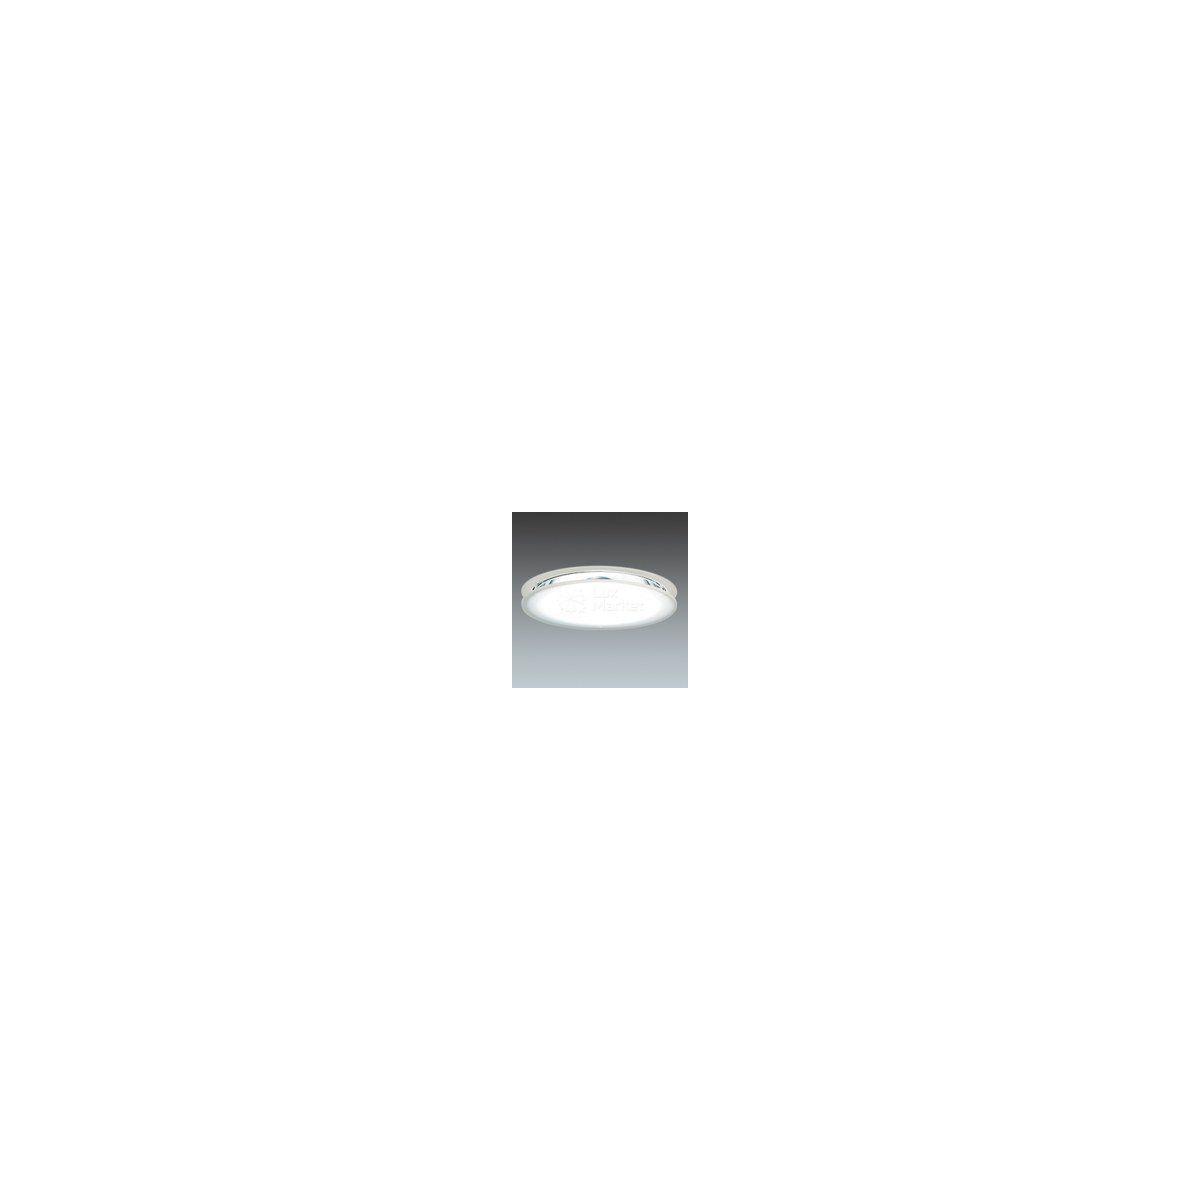 Chalice 1H English - Thorn Lighting